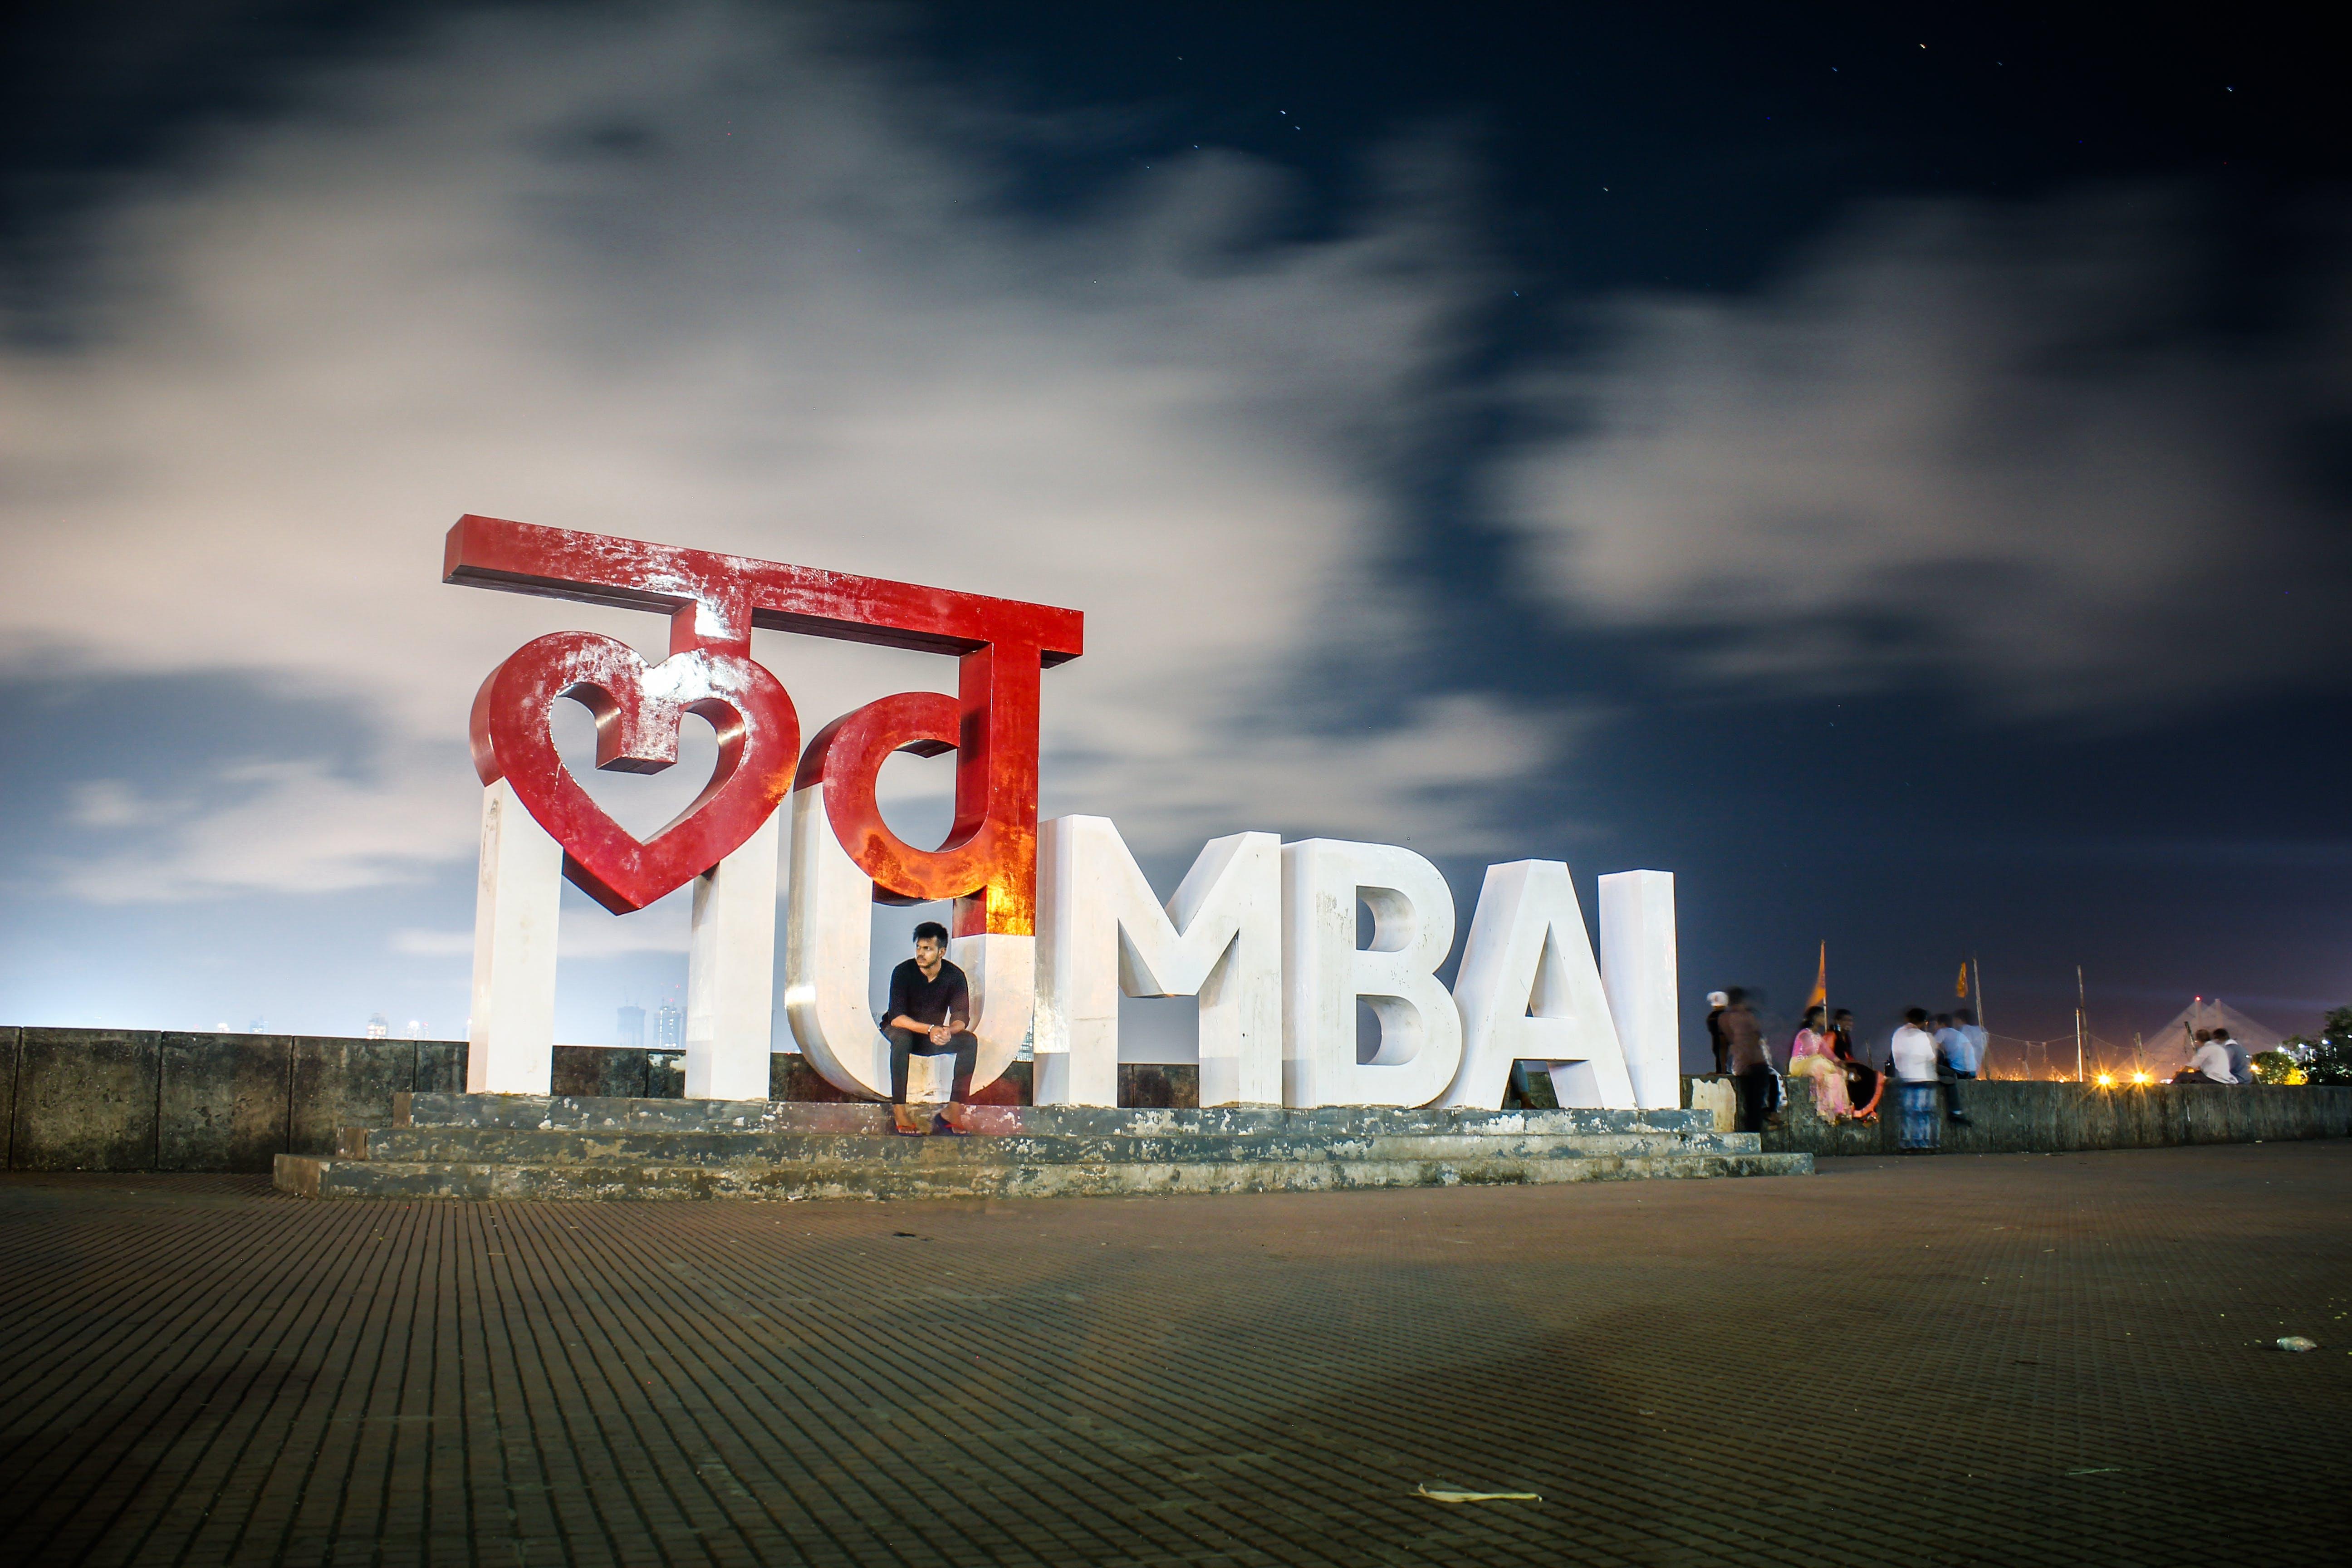 of knight, mumbai, night, oubleexposure